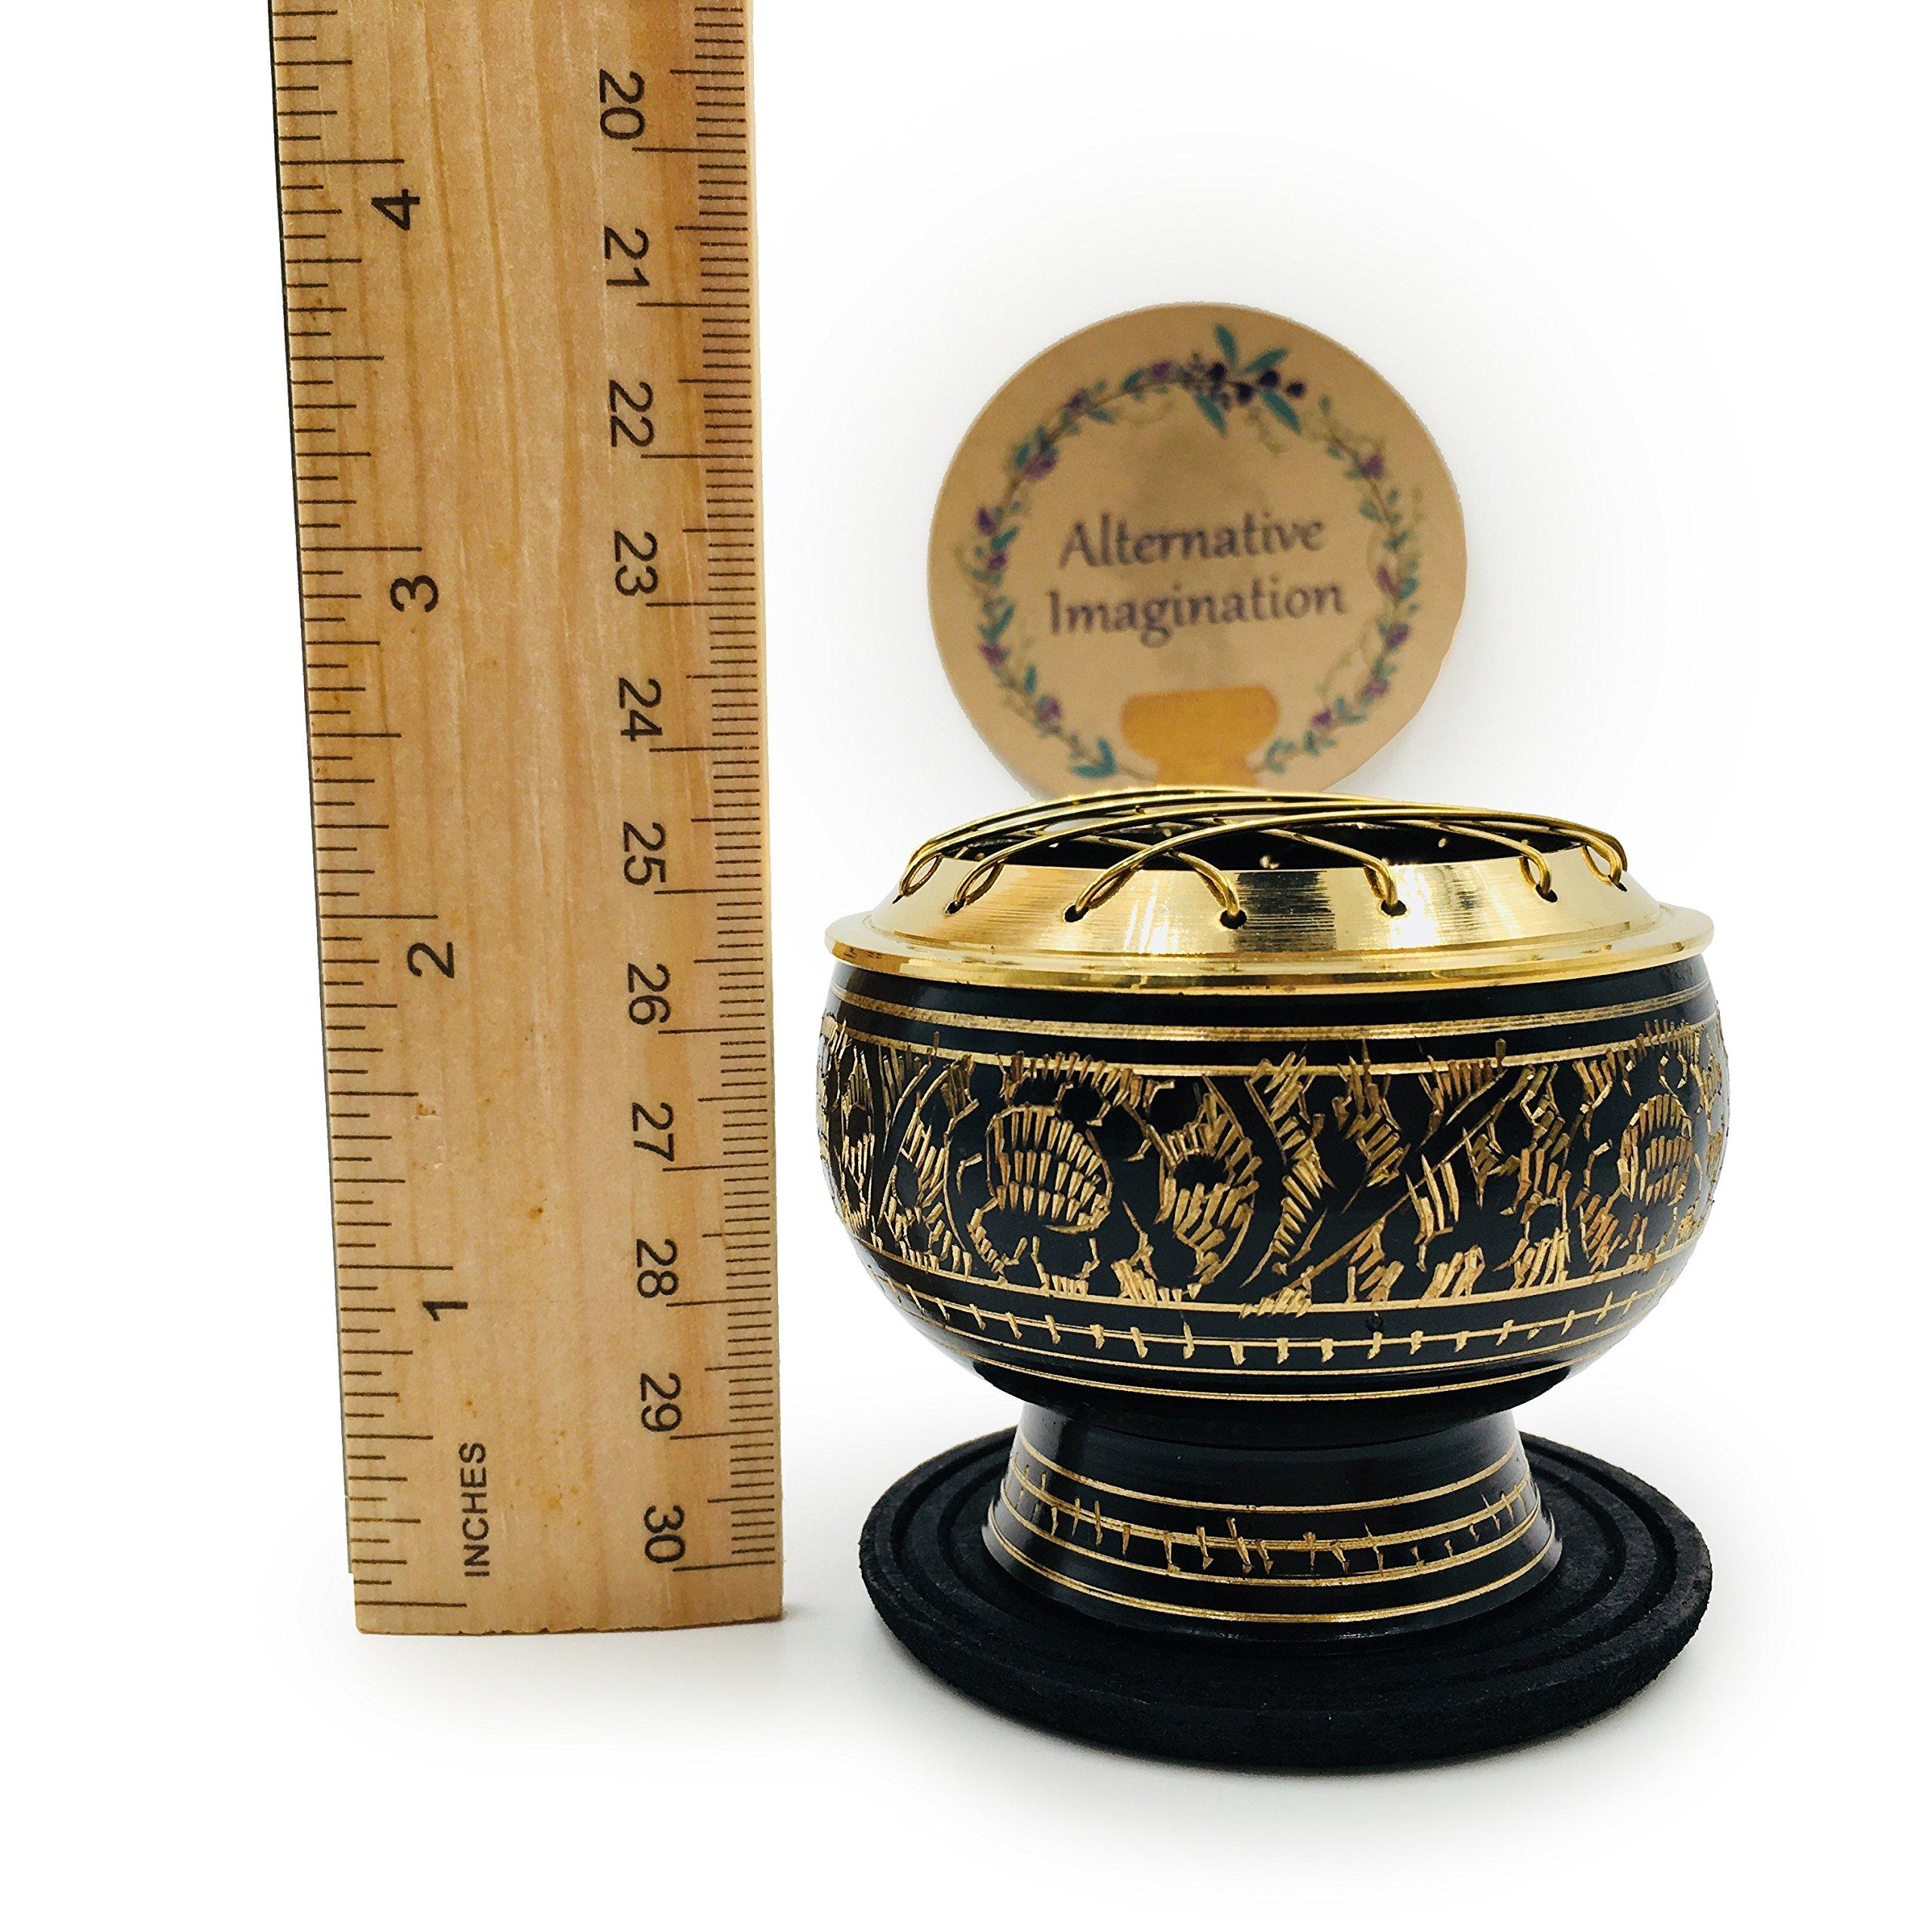 Alternative Imagination Premium Copal Burning Kit (with Tibetan Incense Burner or Brass Screen Burner) (Black Brass) by Alternative Imagination (Image #6)